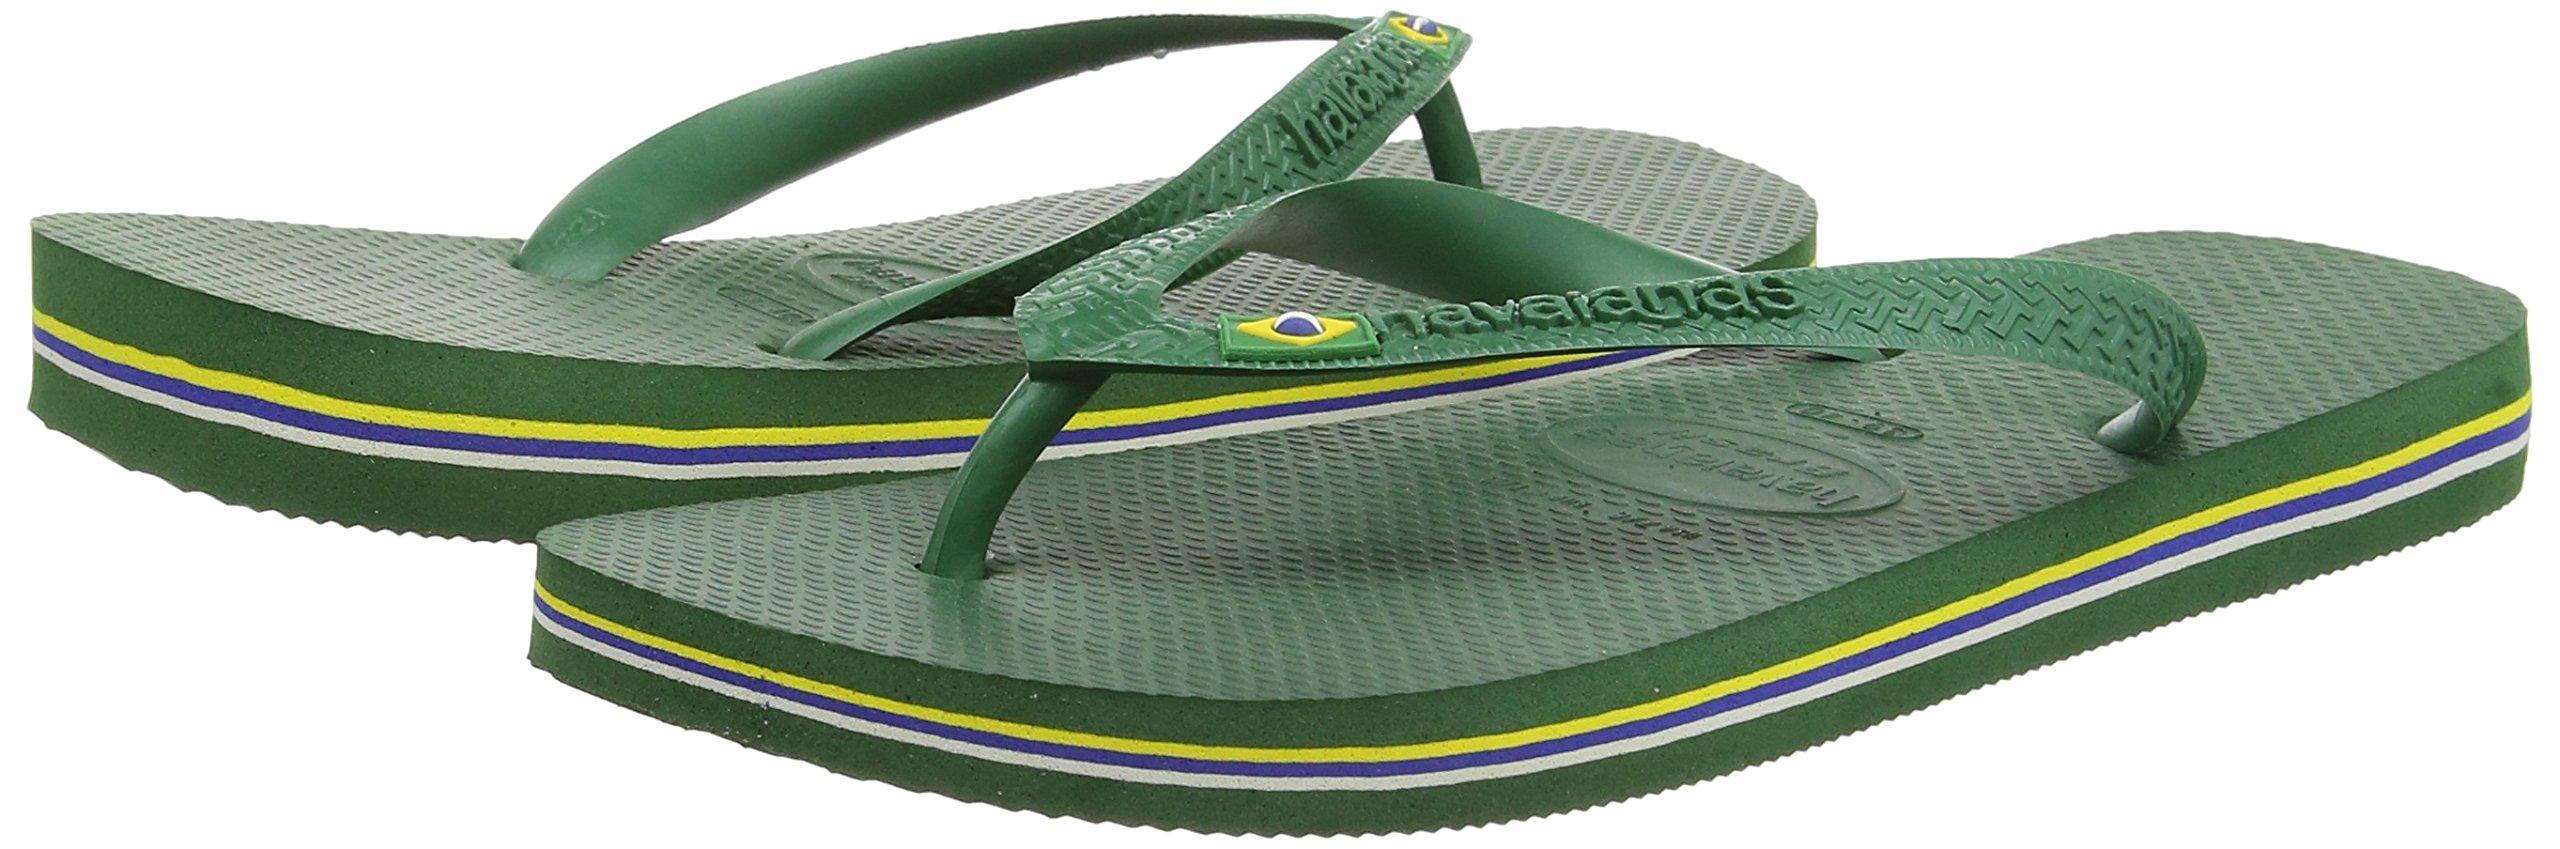 Havaianas Brasil, Unisex Adult's Flip Flops, Green (Brasil Amazonia), 3/4 UK (37/38EU) (35/36 BR) by Havaianas (Image #7)